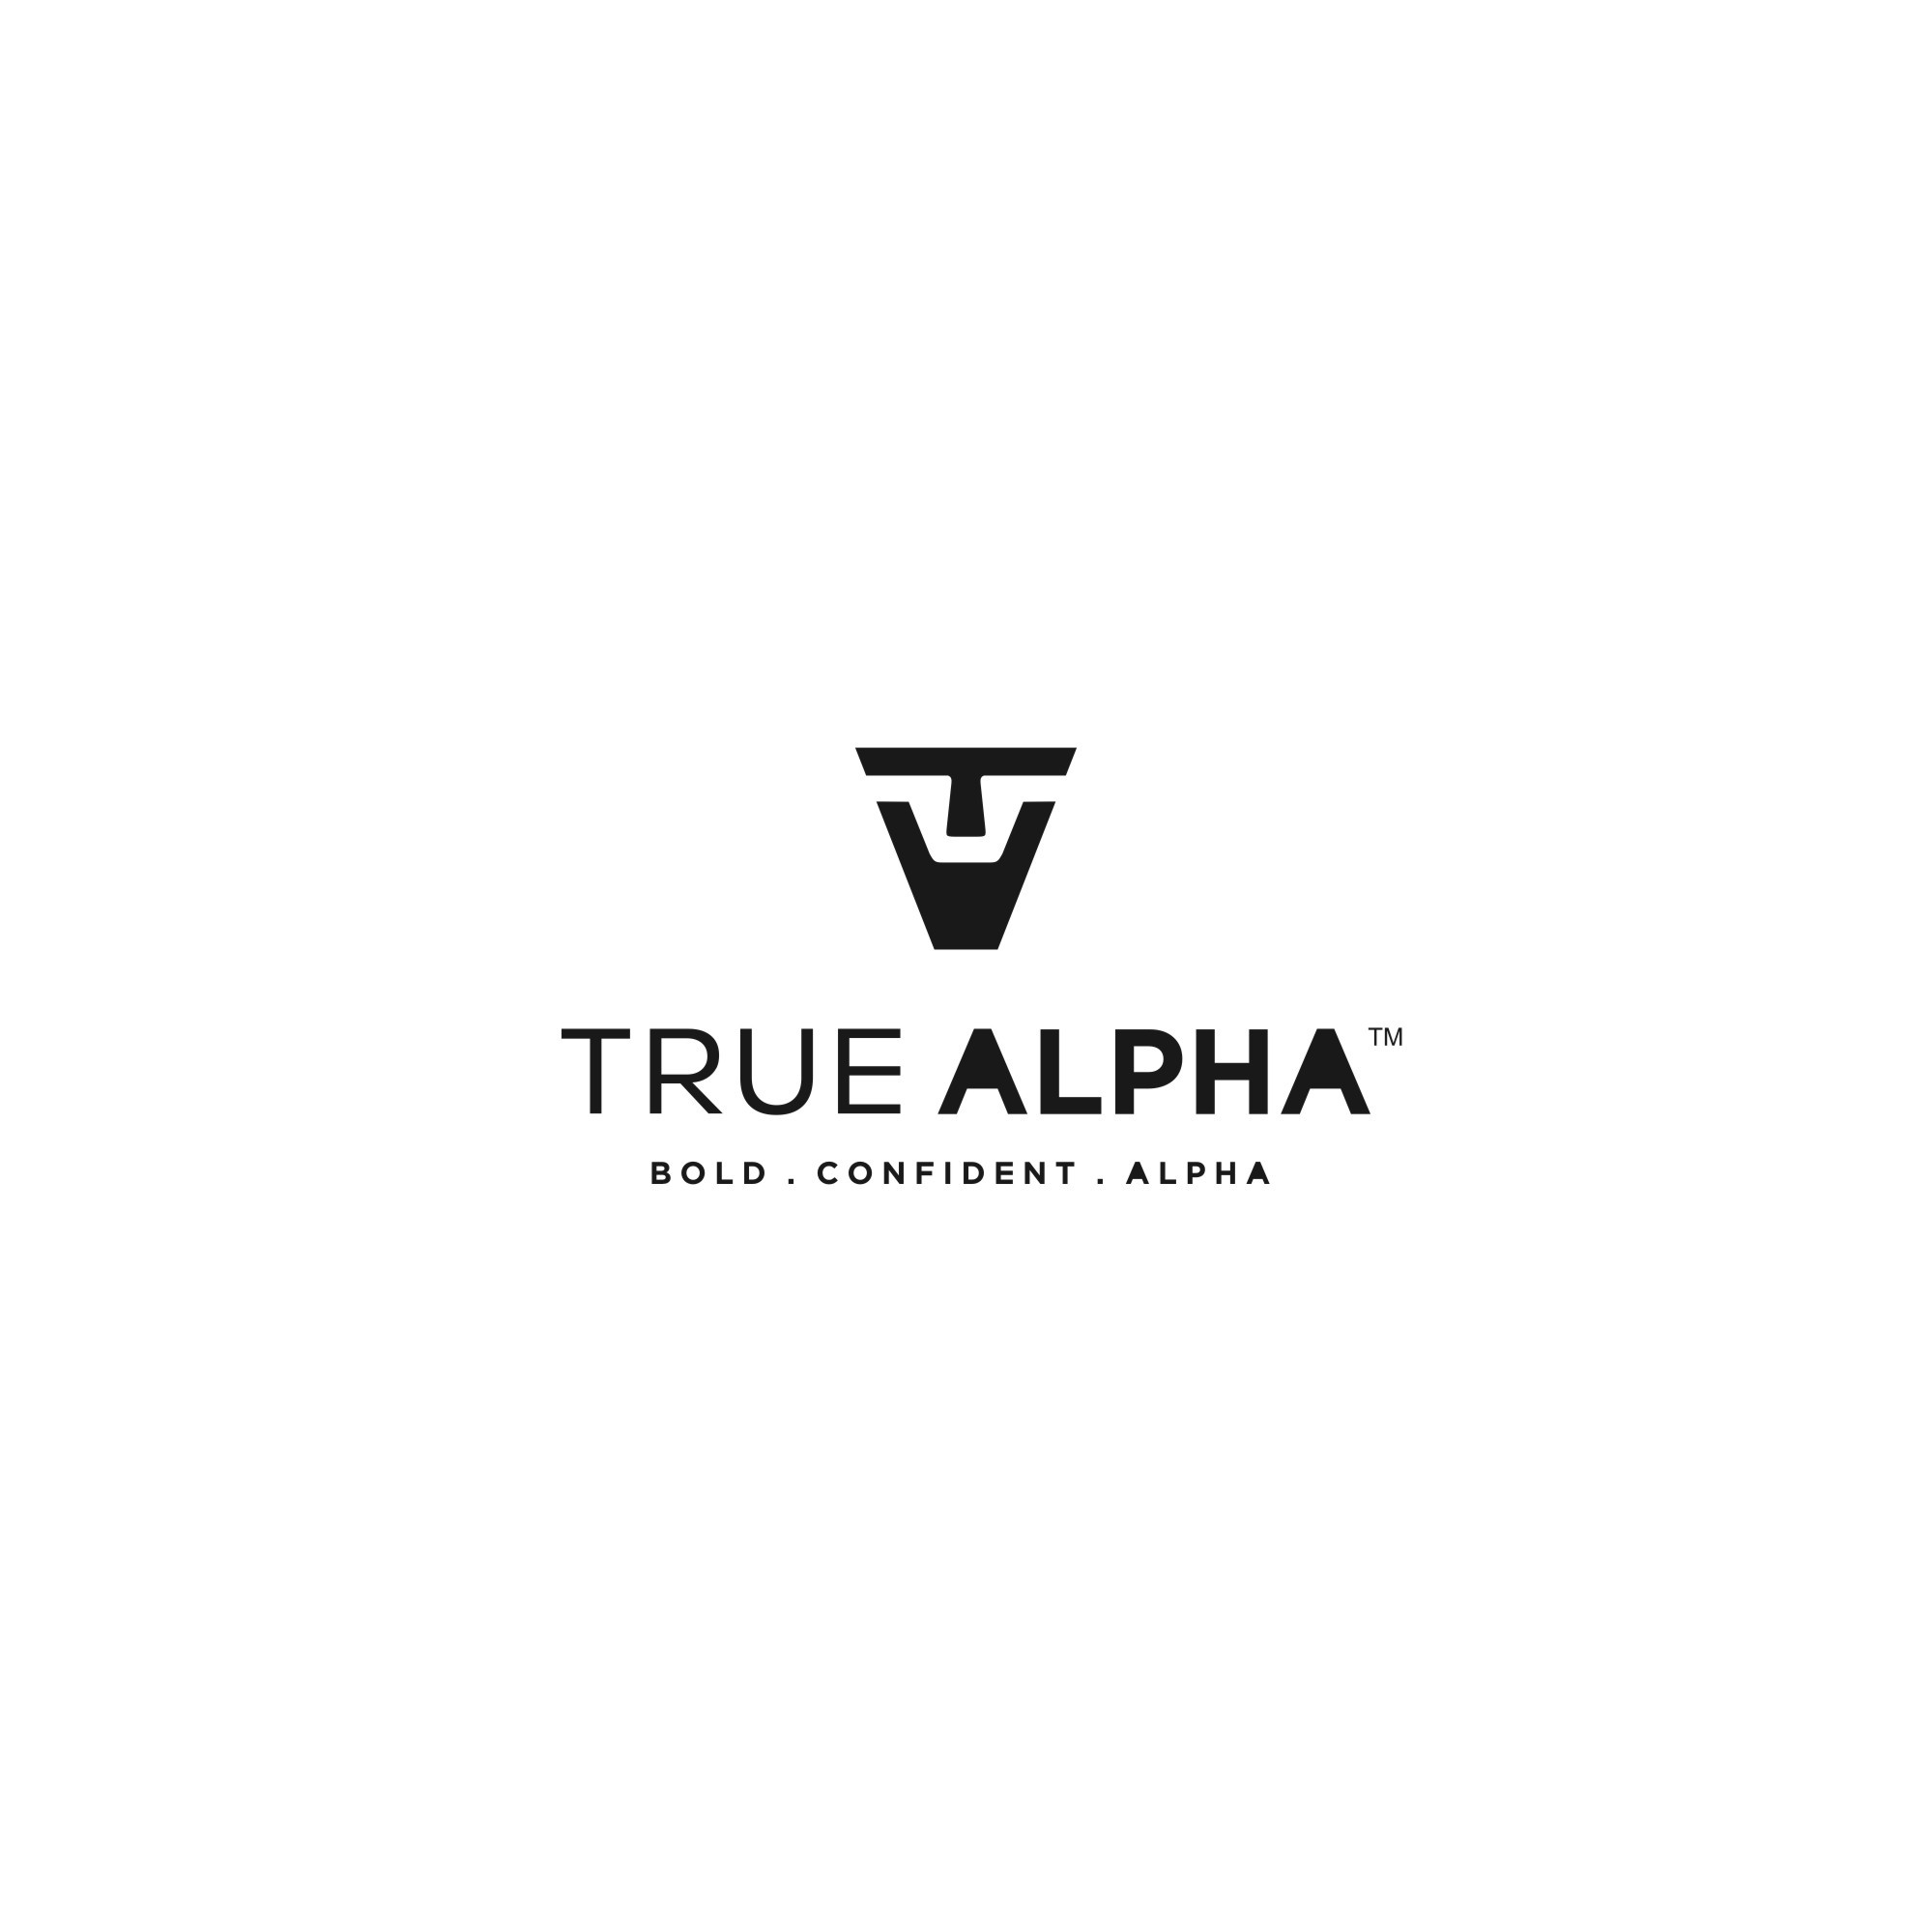 Create a logo for a beard oil brand worthy of a true alpha male